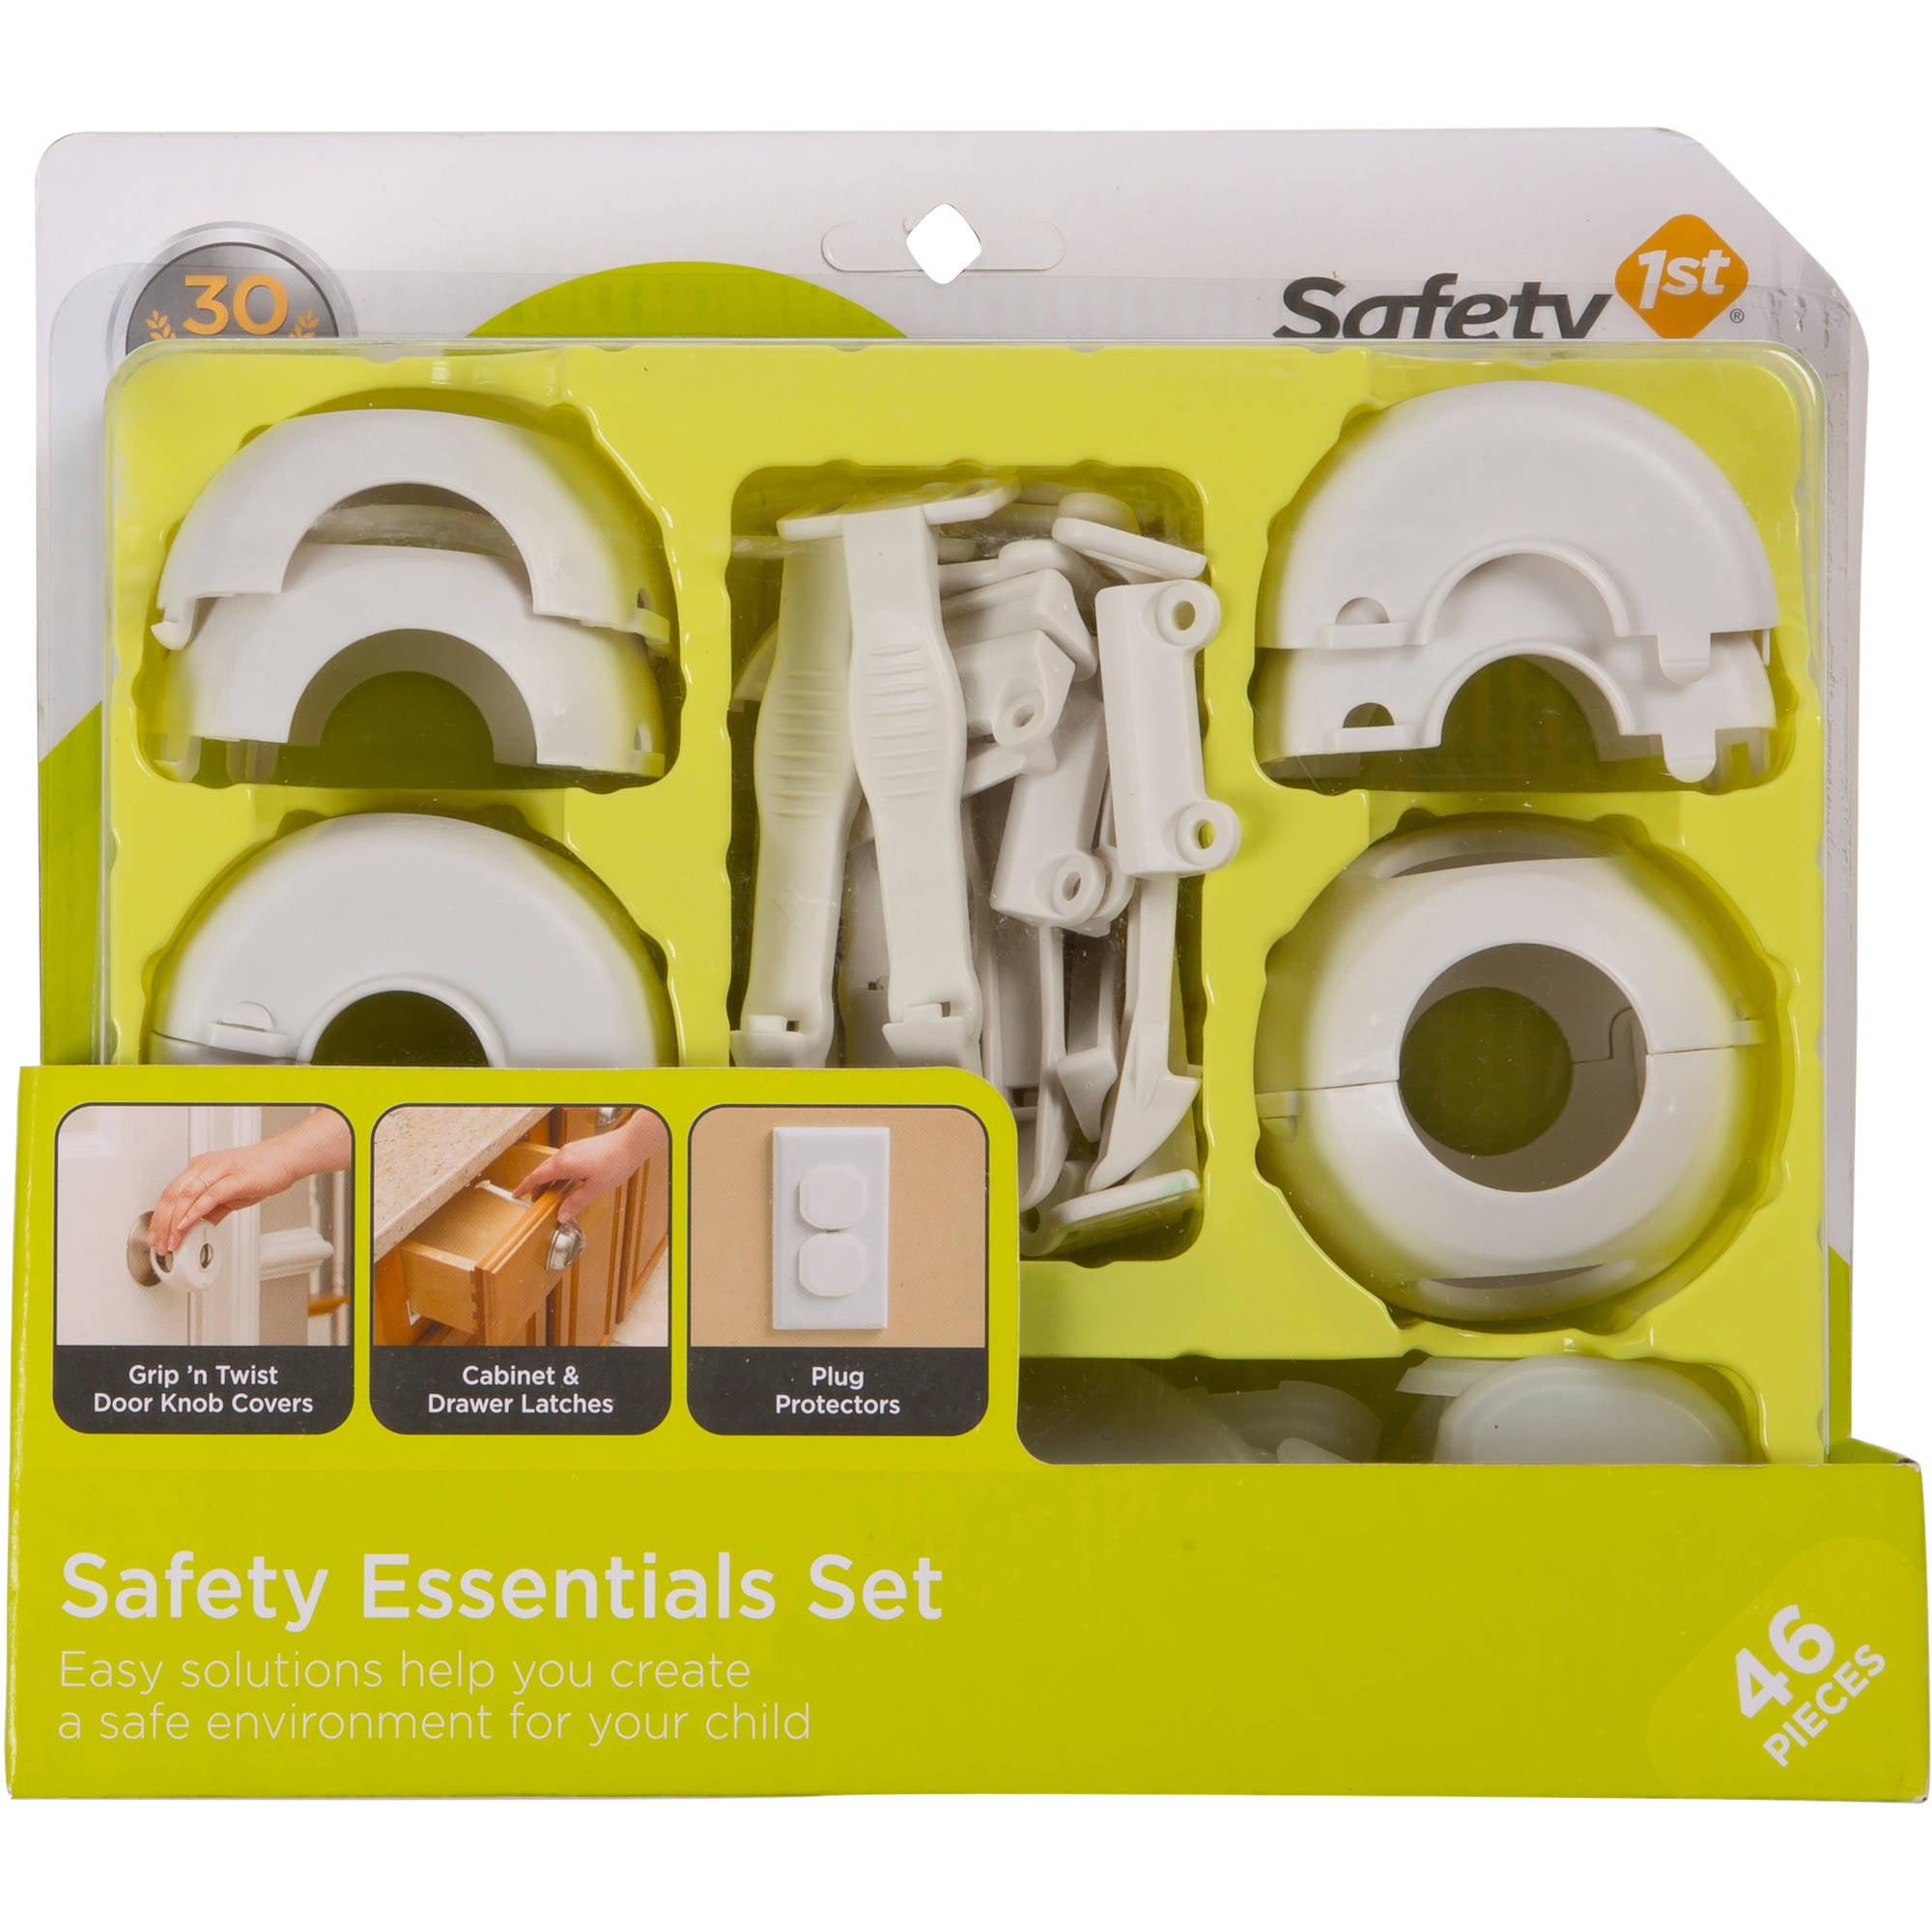 100 safety kit for extension spring garage doors archaicawfulge door spring pictures. Black Bedroom Furniture Sets. Home Design Ideas